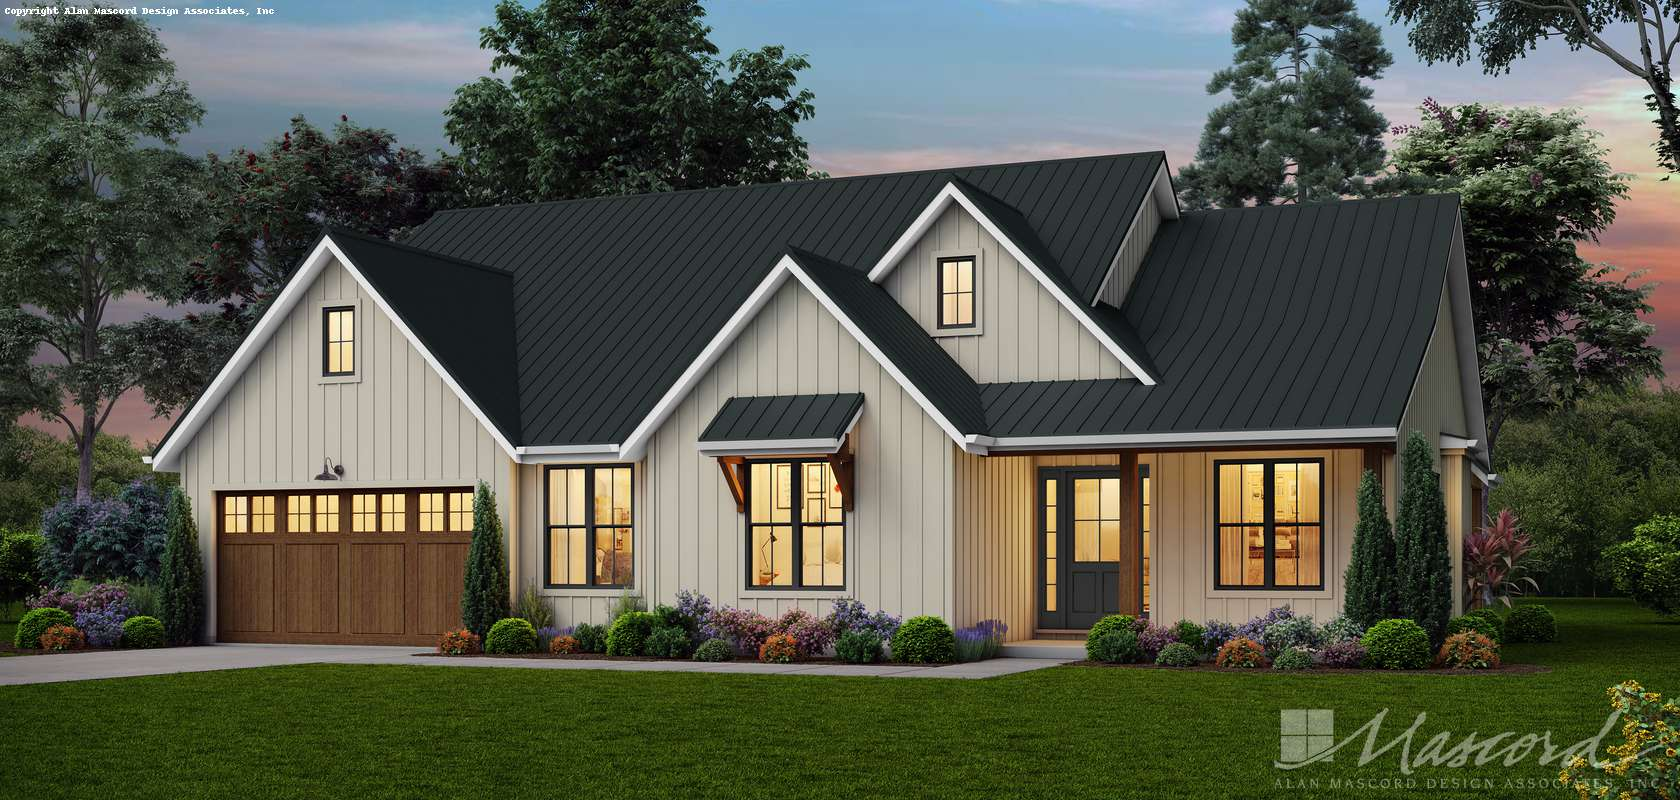 Mascord House Plan 1231EB: The Oakhaven